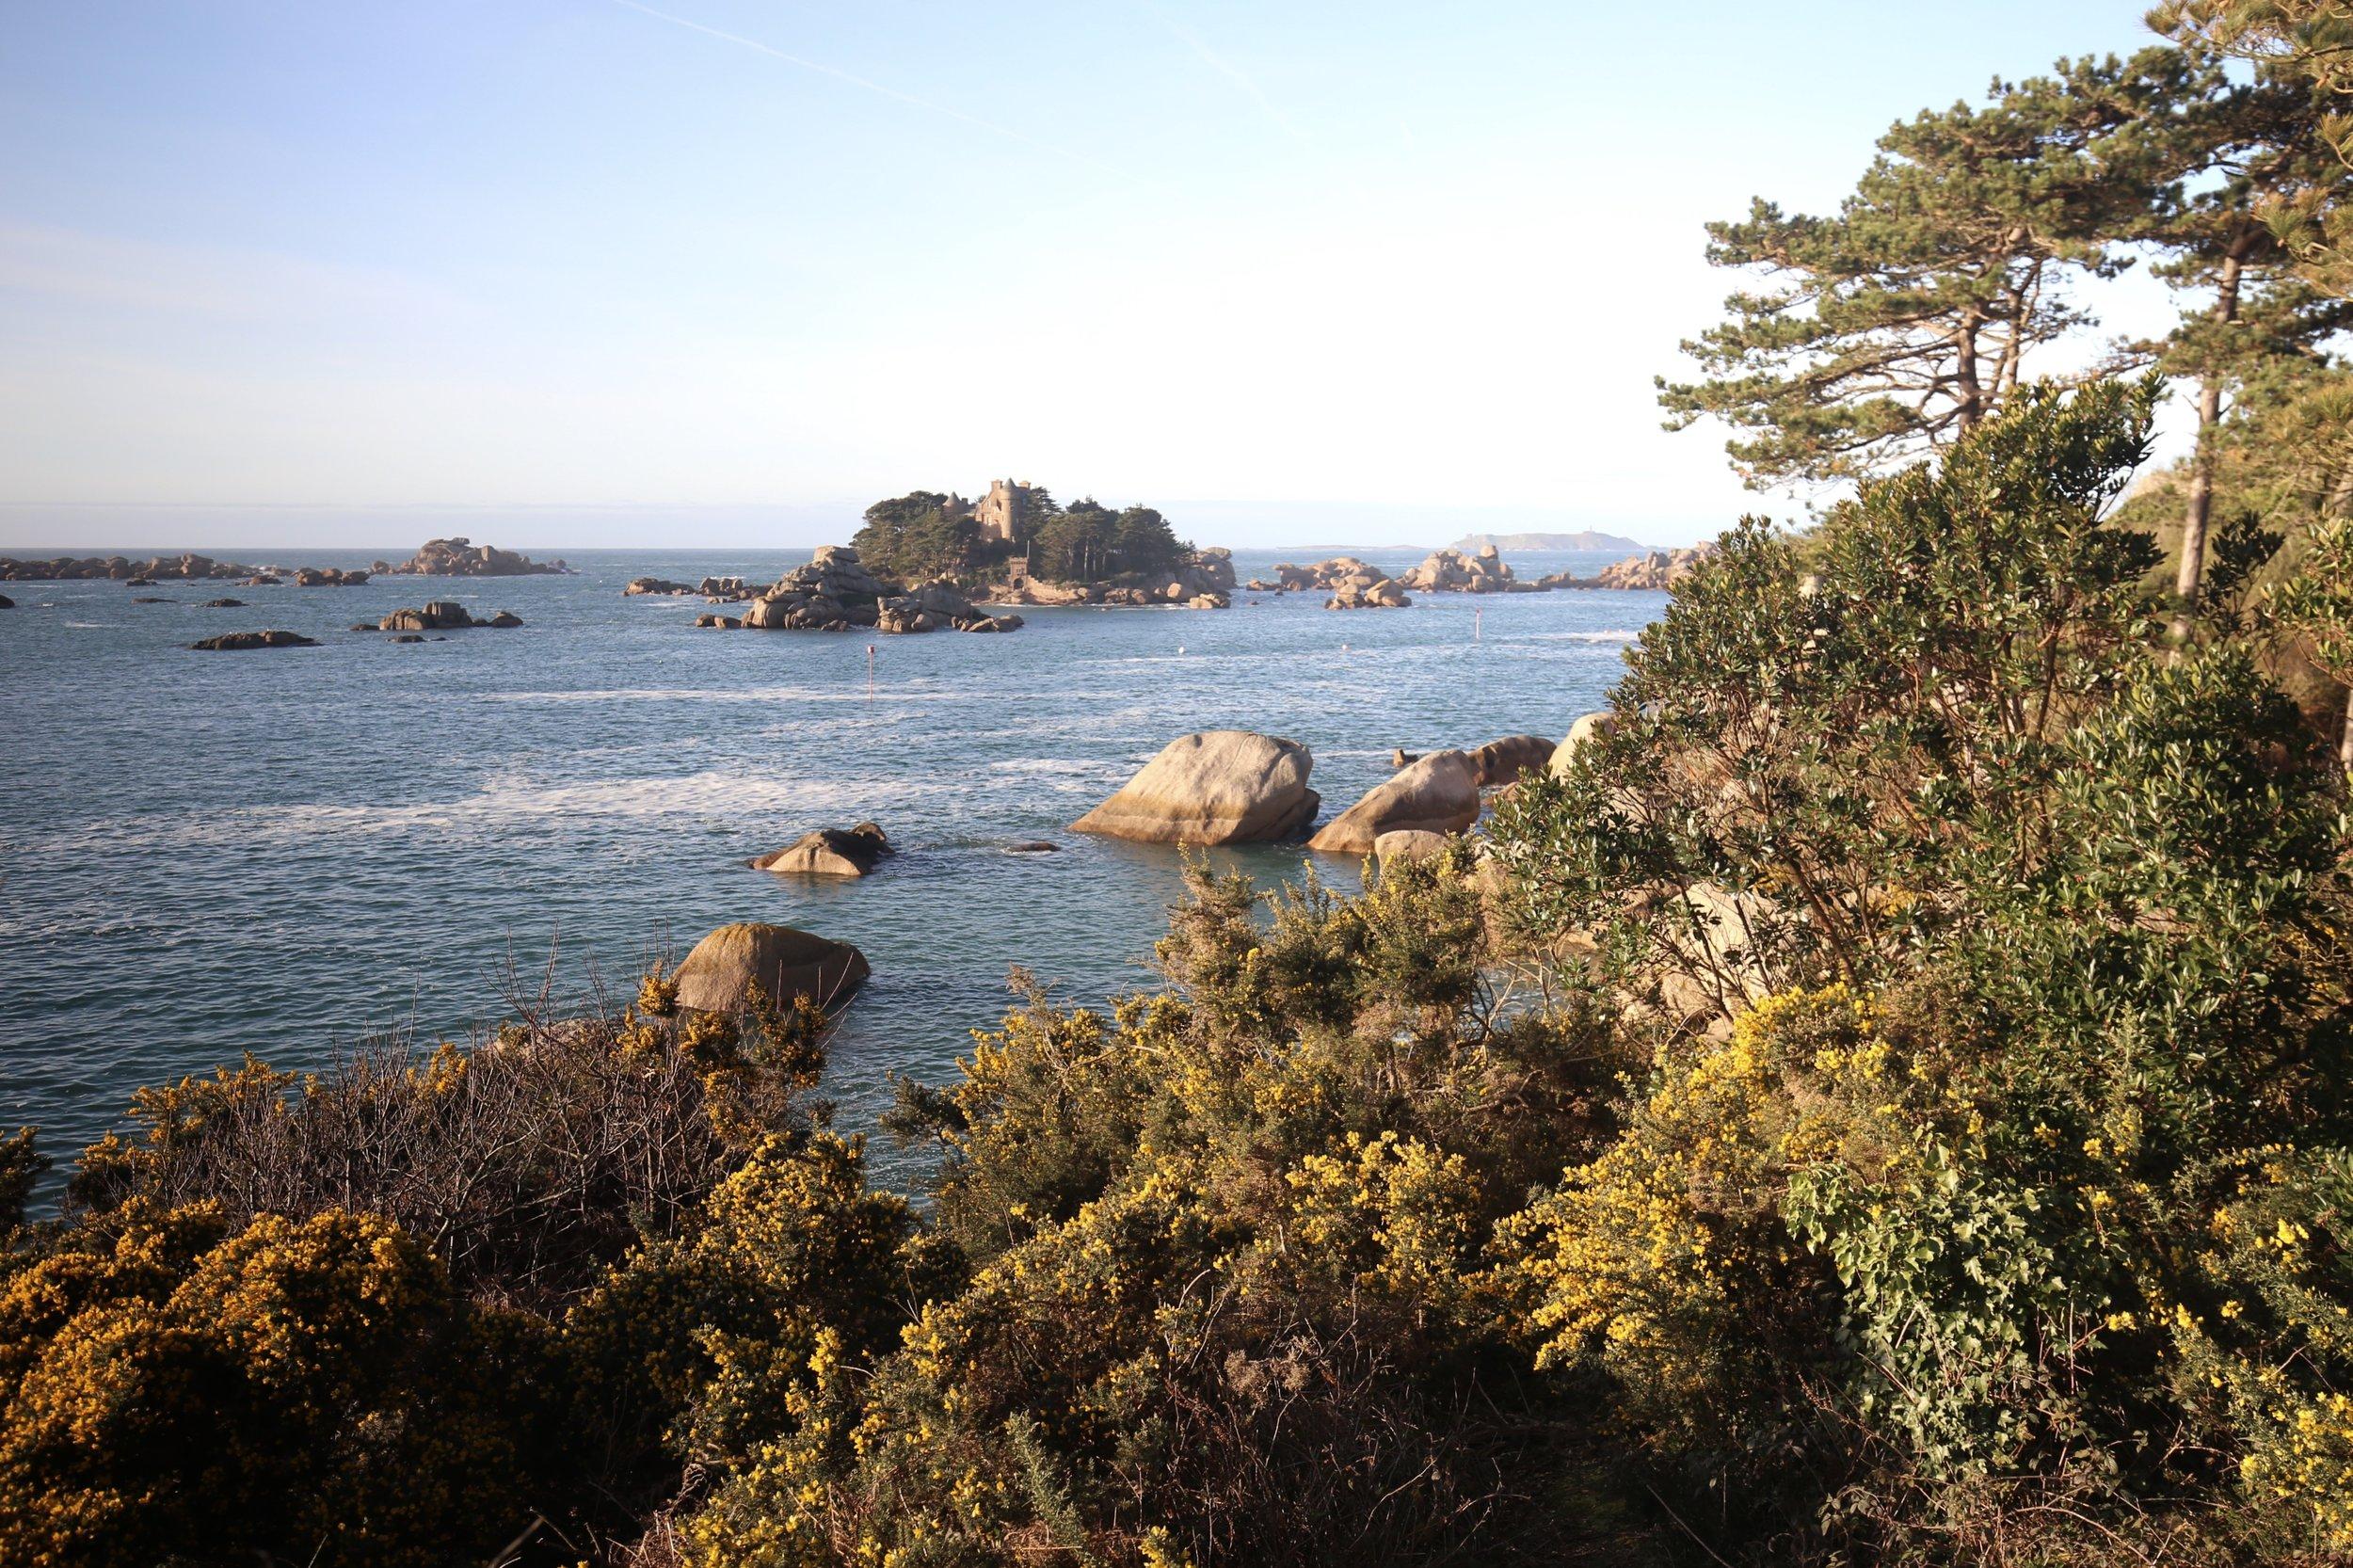 Castles on islands and lush foliage on the Granite Rose Coast.